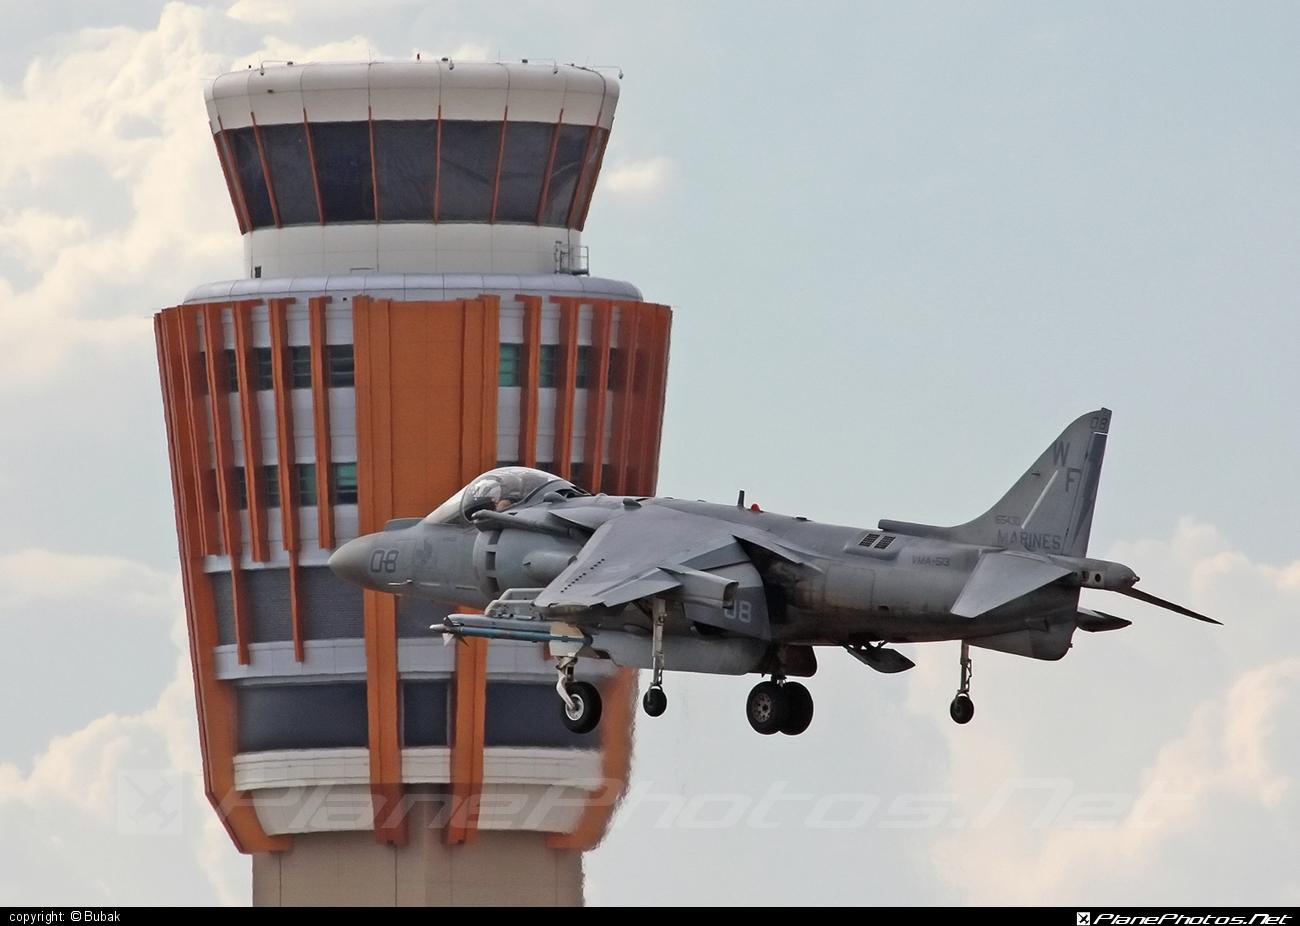 McDonnell Douglas AV-8B Harrier II+ - 165430 operated by US Marine Corps (USMC) #mcdonnelldouglas